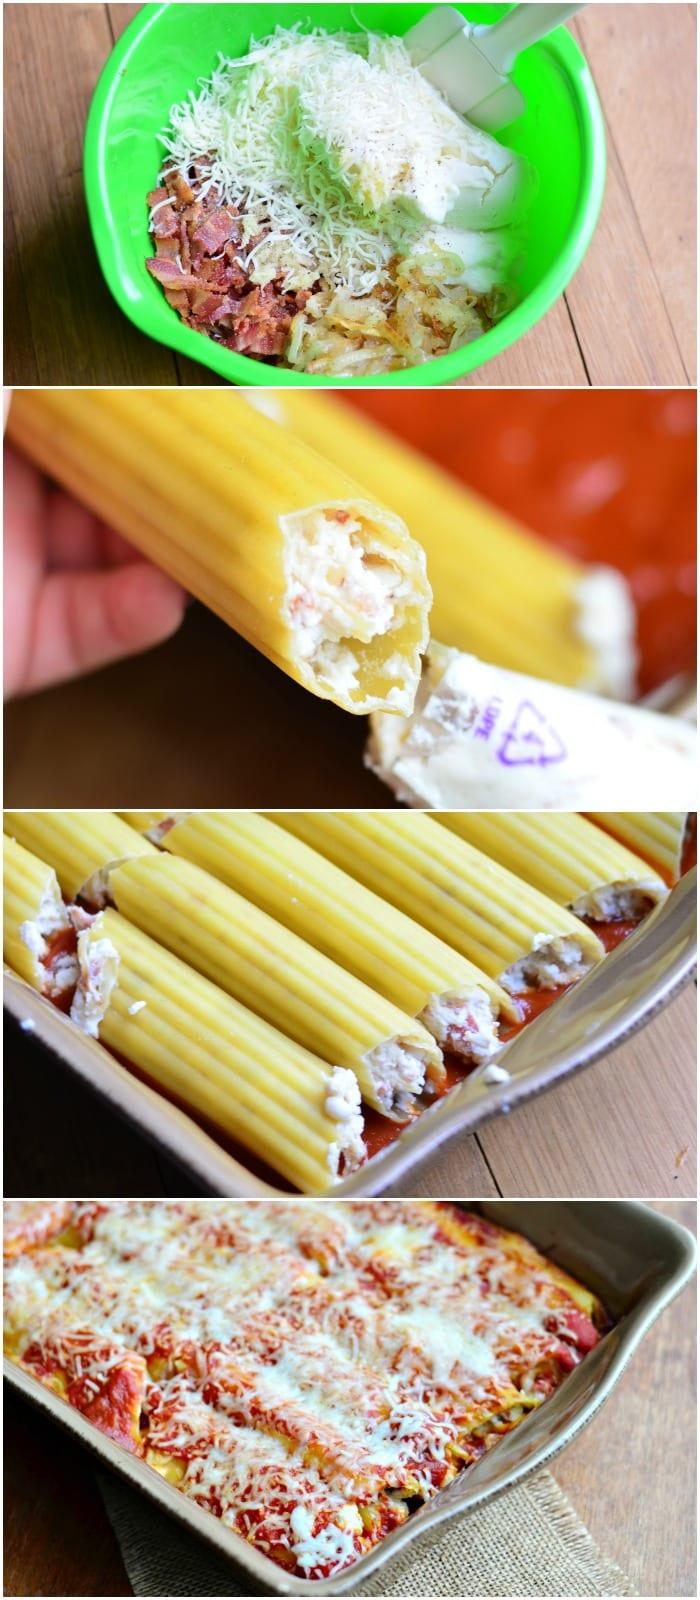 Bacon & Caramelized Onion Manicotti Process